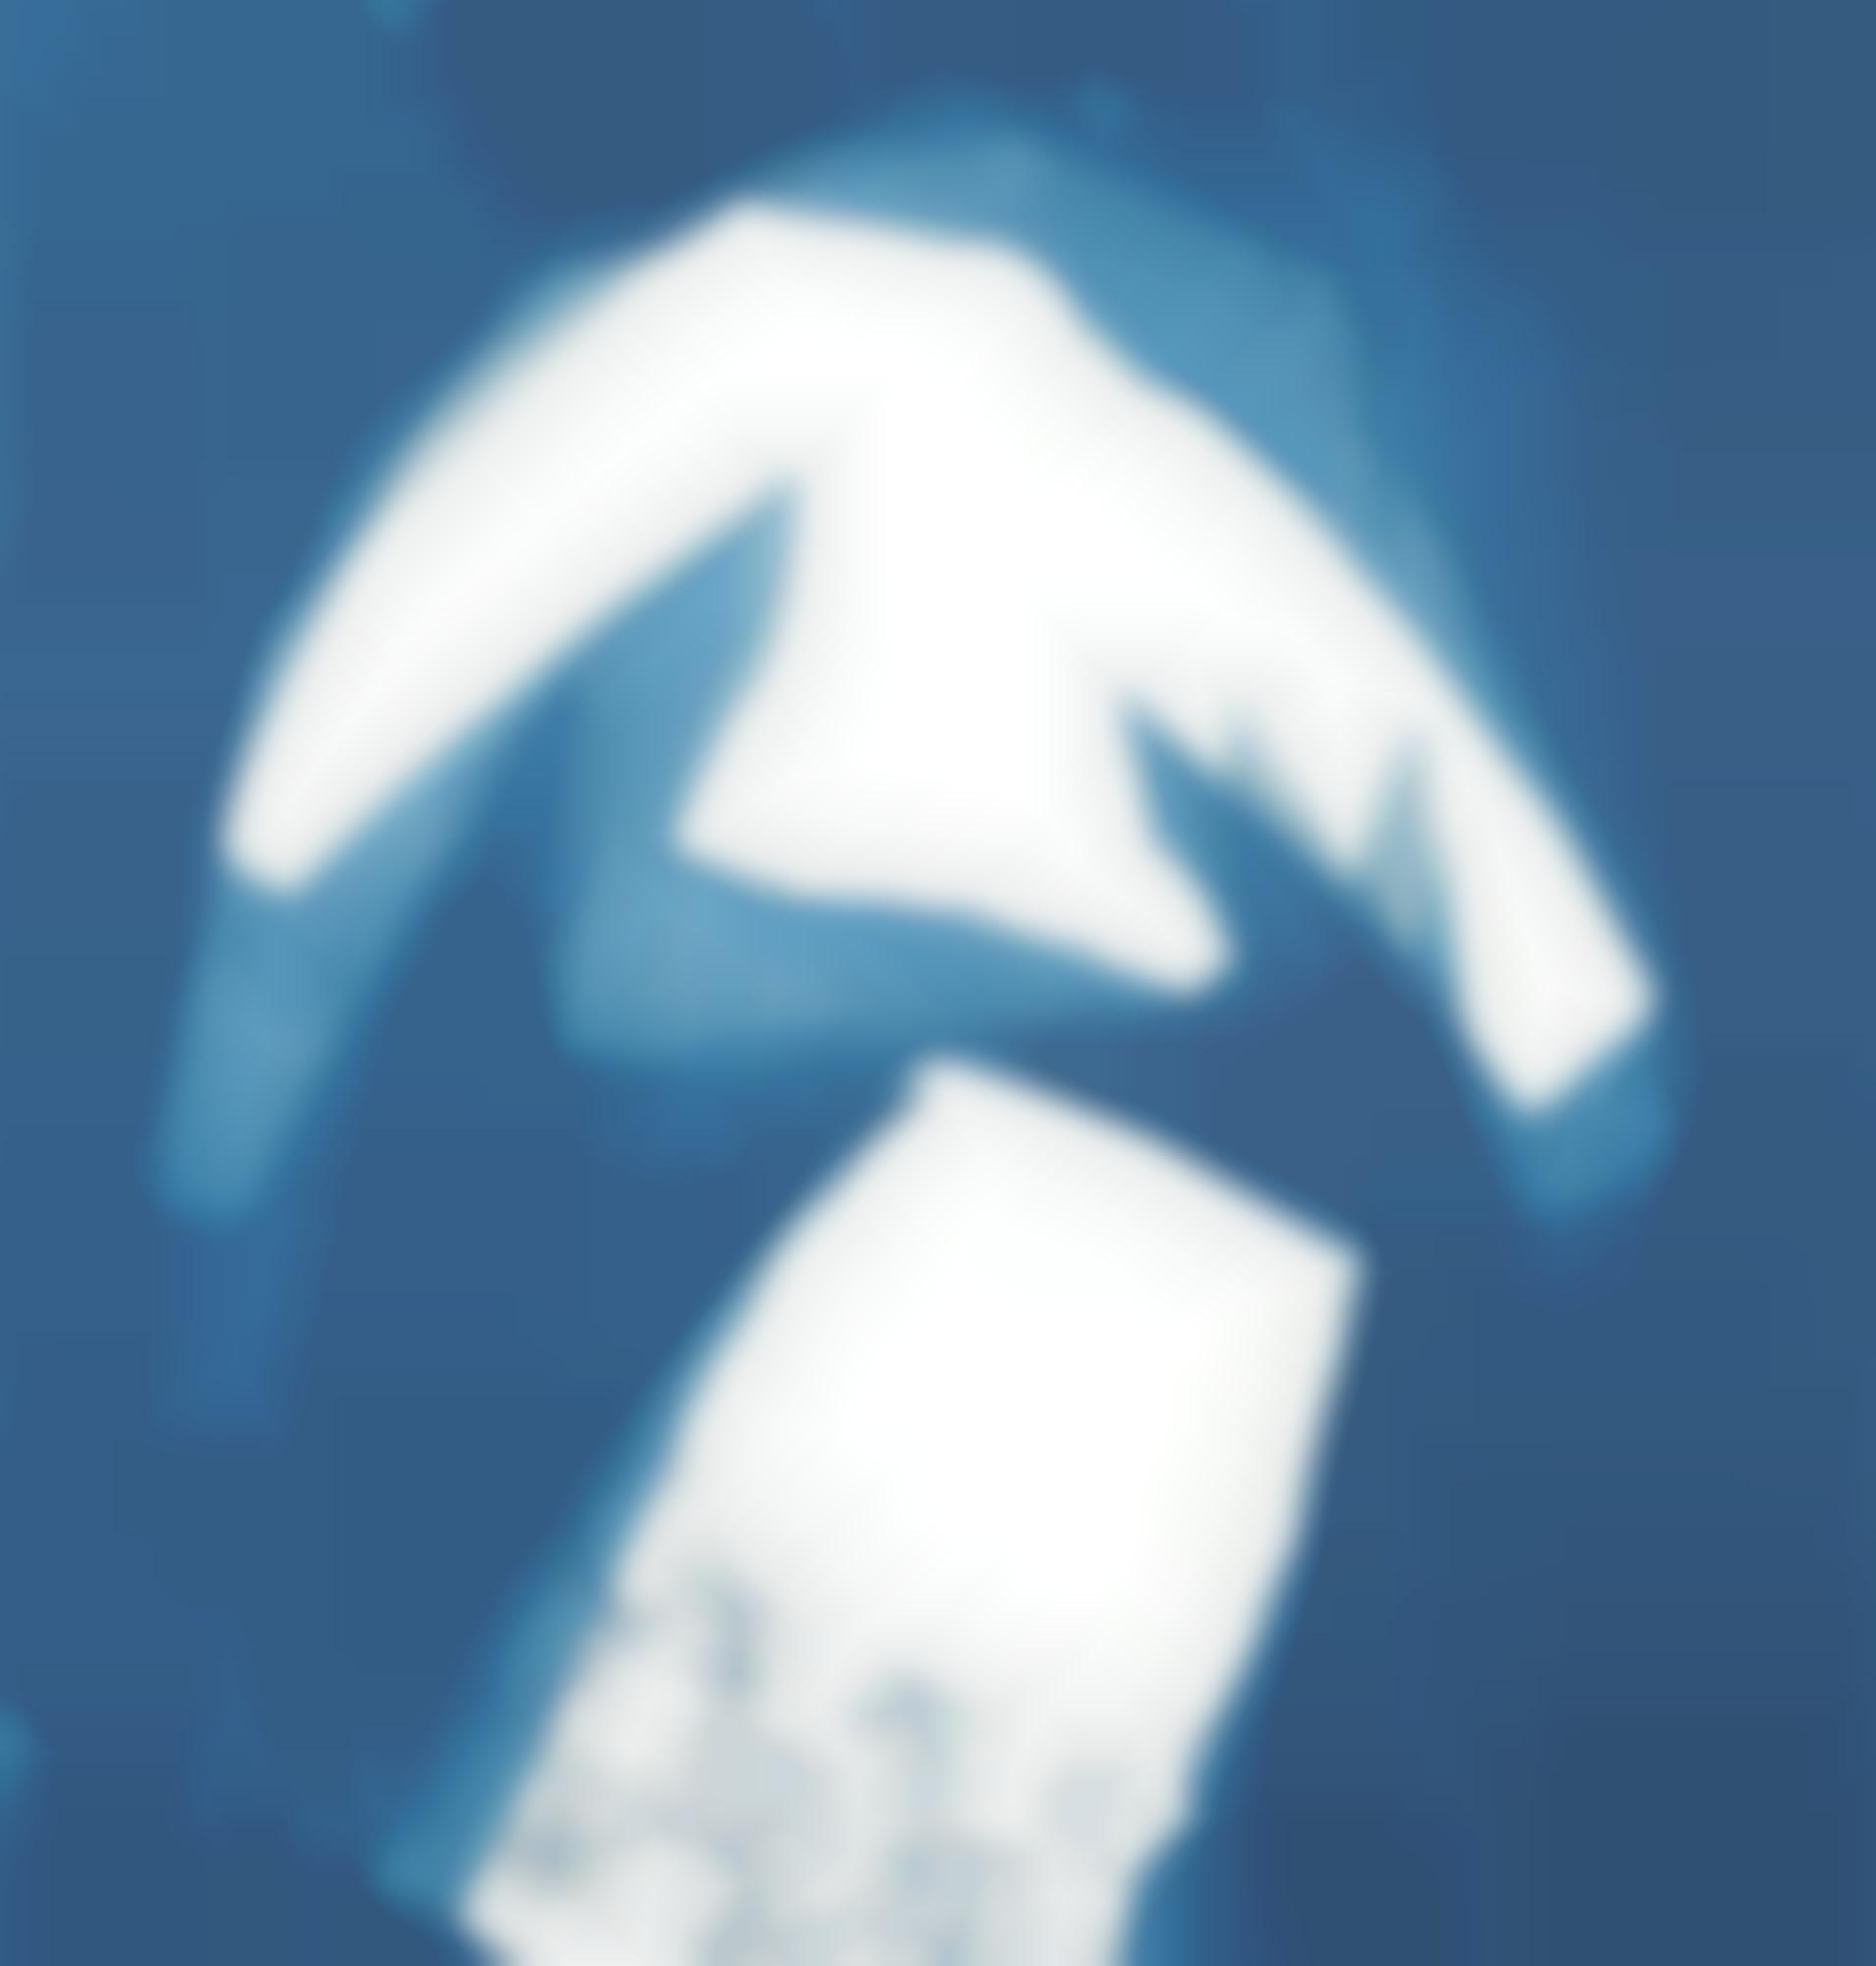 Nancy Wilson-Pajic-Katerina, (Les Apparitions), 1998-1998